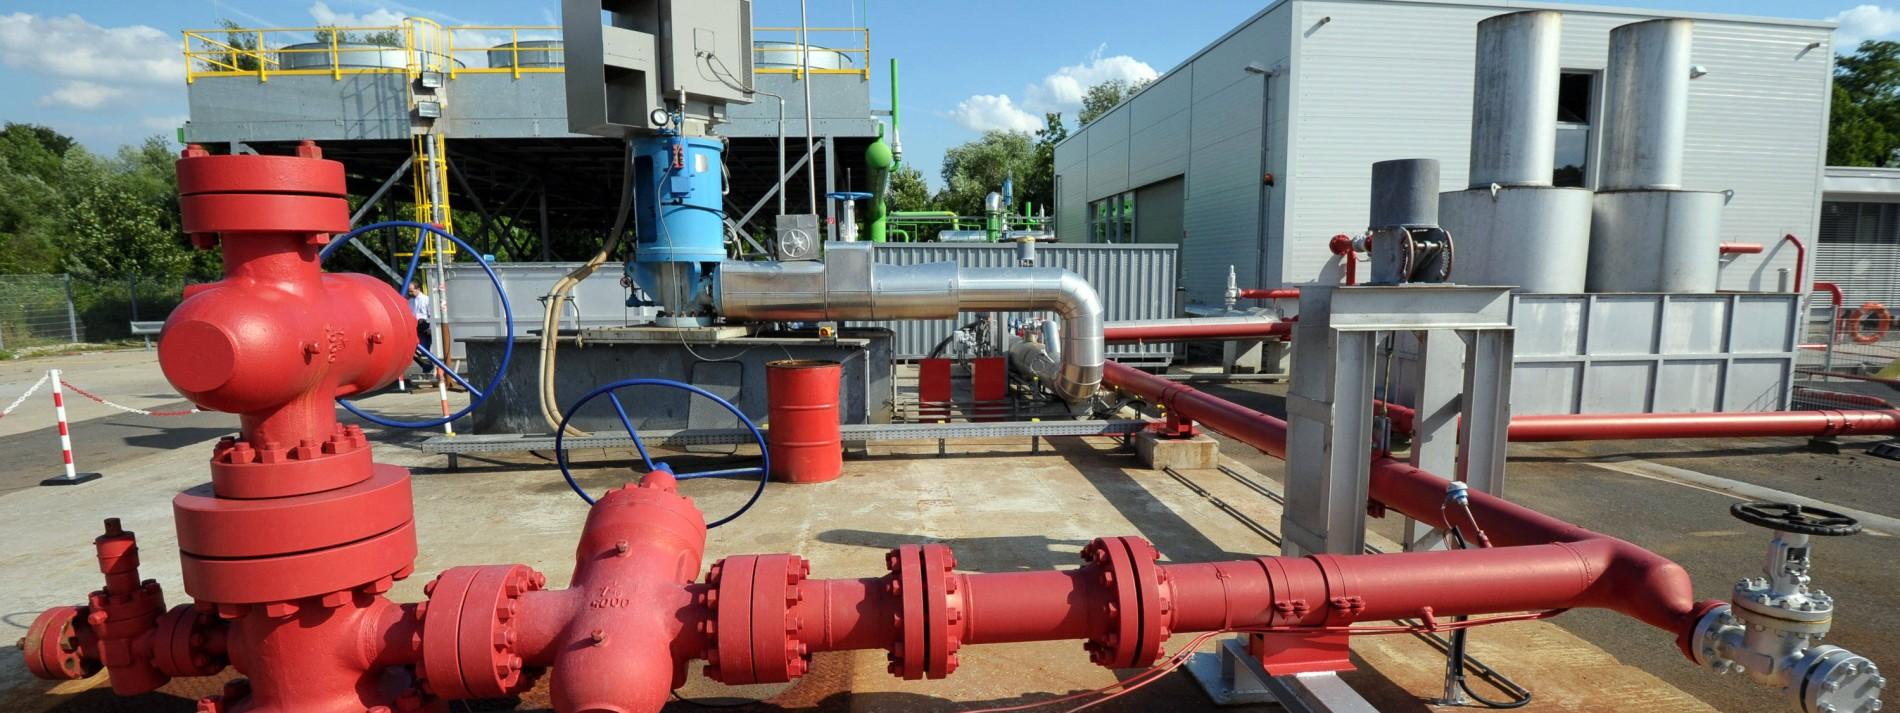 Erstes Geothermiekraftwerk Hessens soll nahe Trebur entstehen